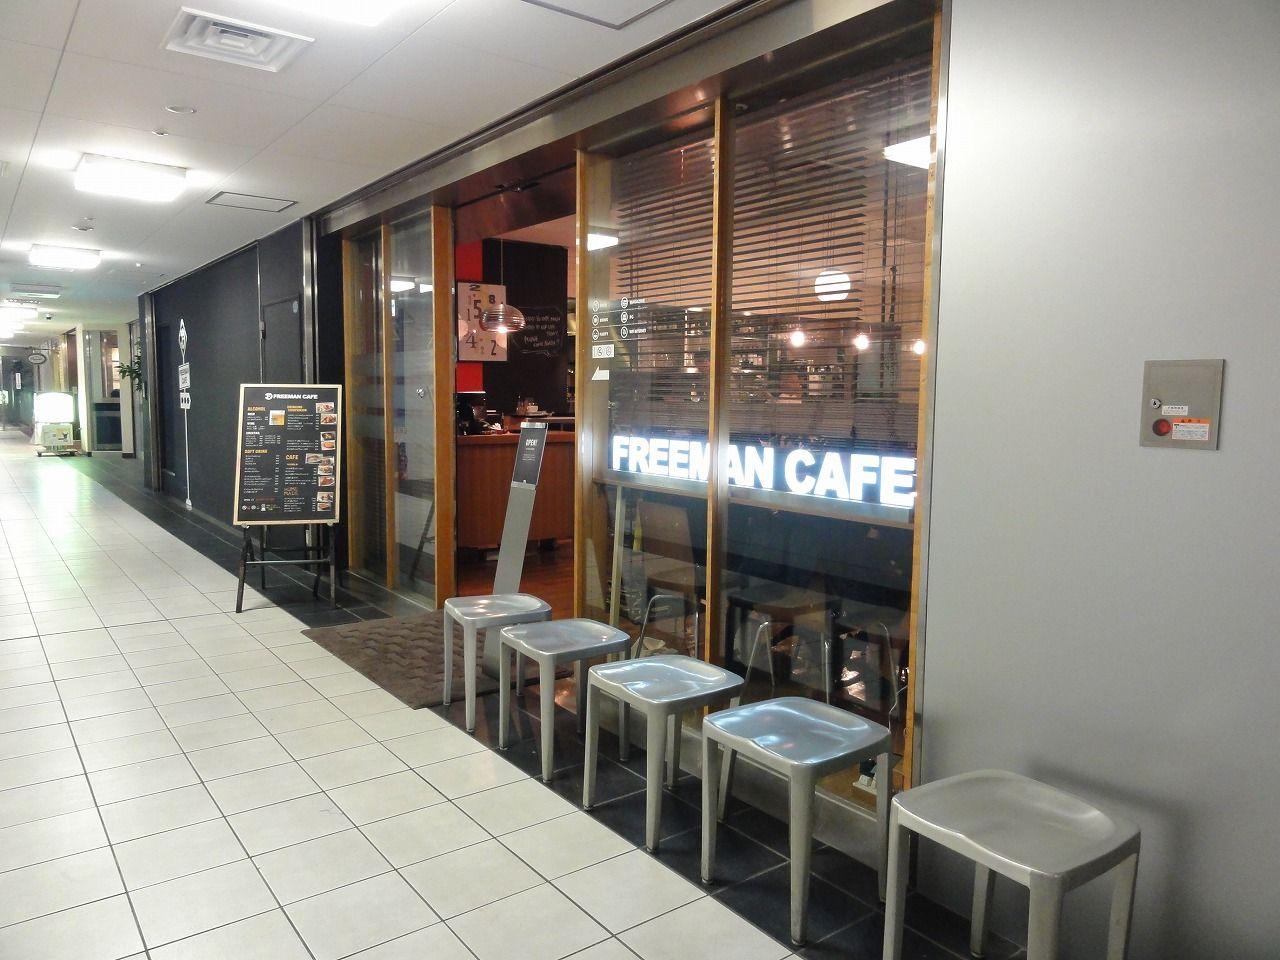 FREEMAN CAFE 1